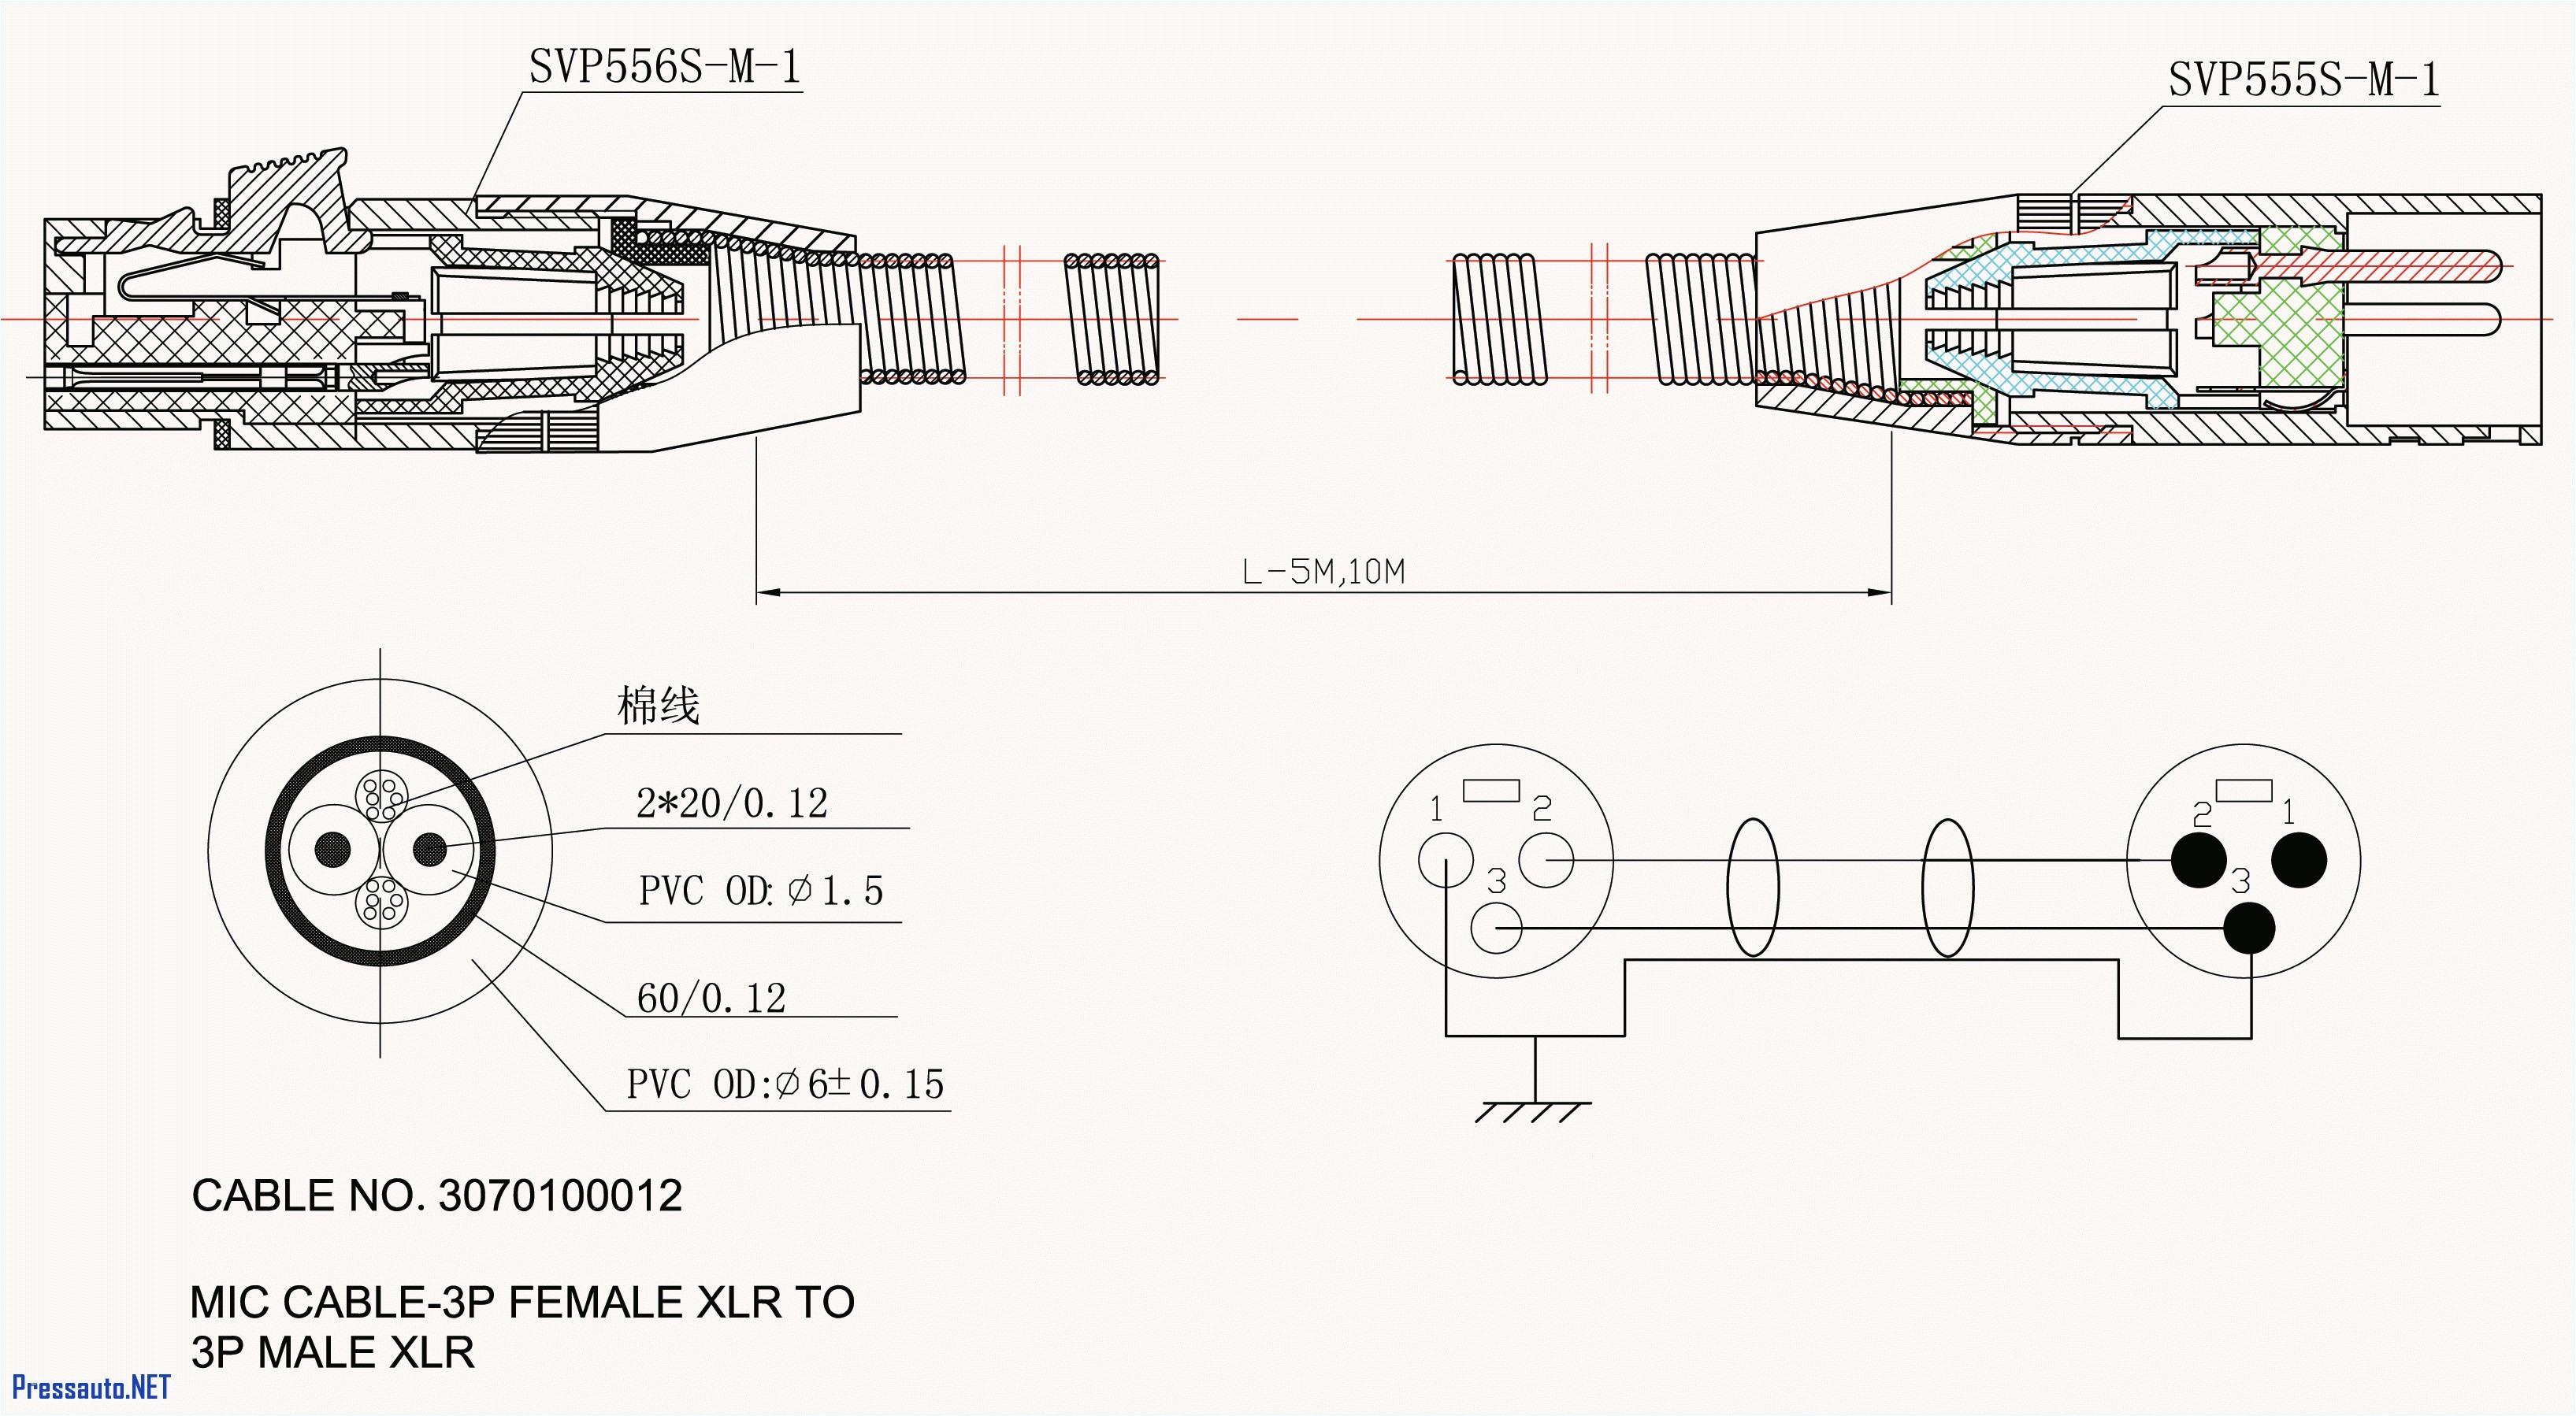 4 prong twist lock plug wiring diagram sample wiring diagram sample4 prong twist lock plug wiring